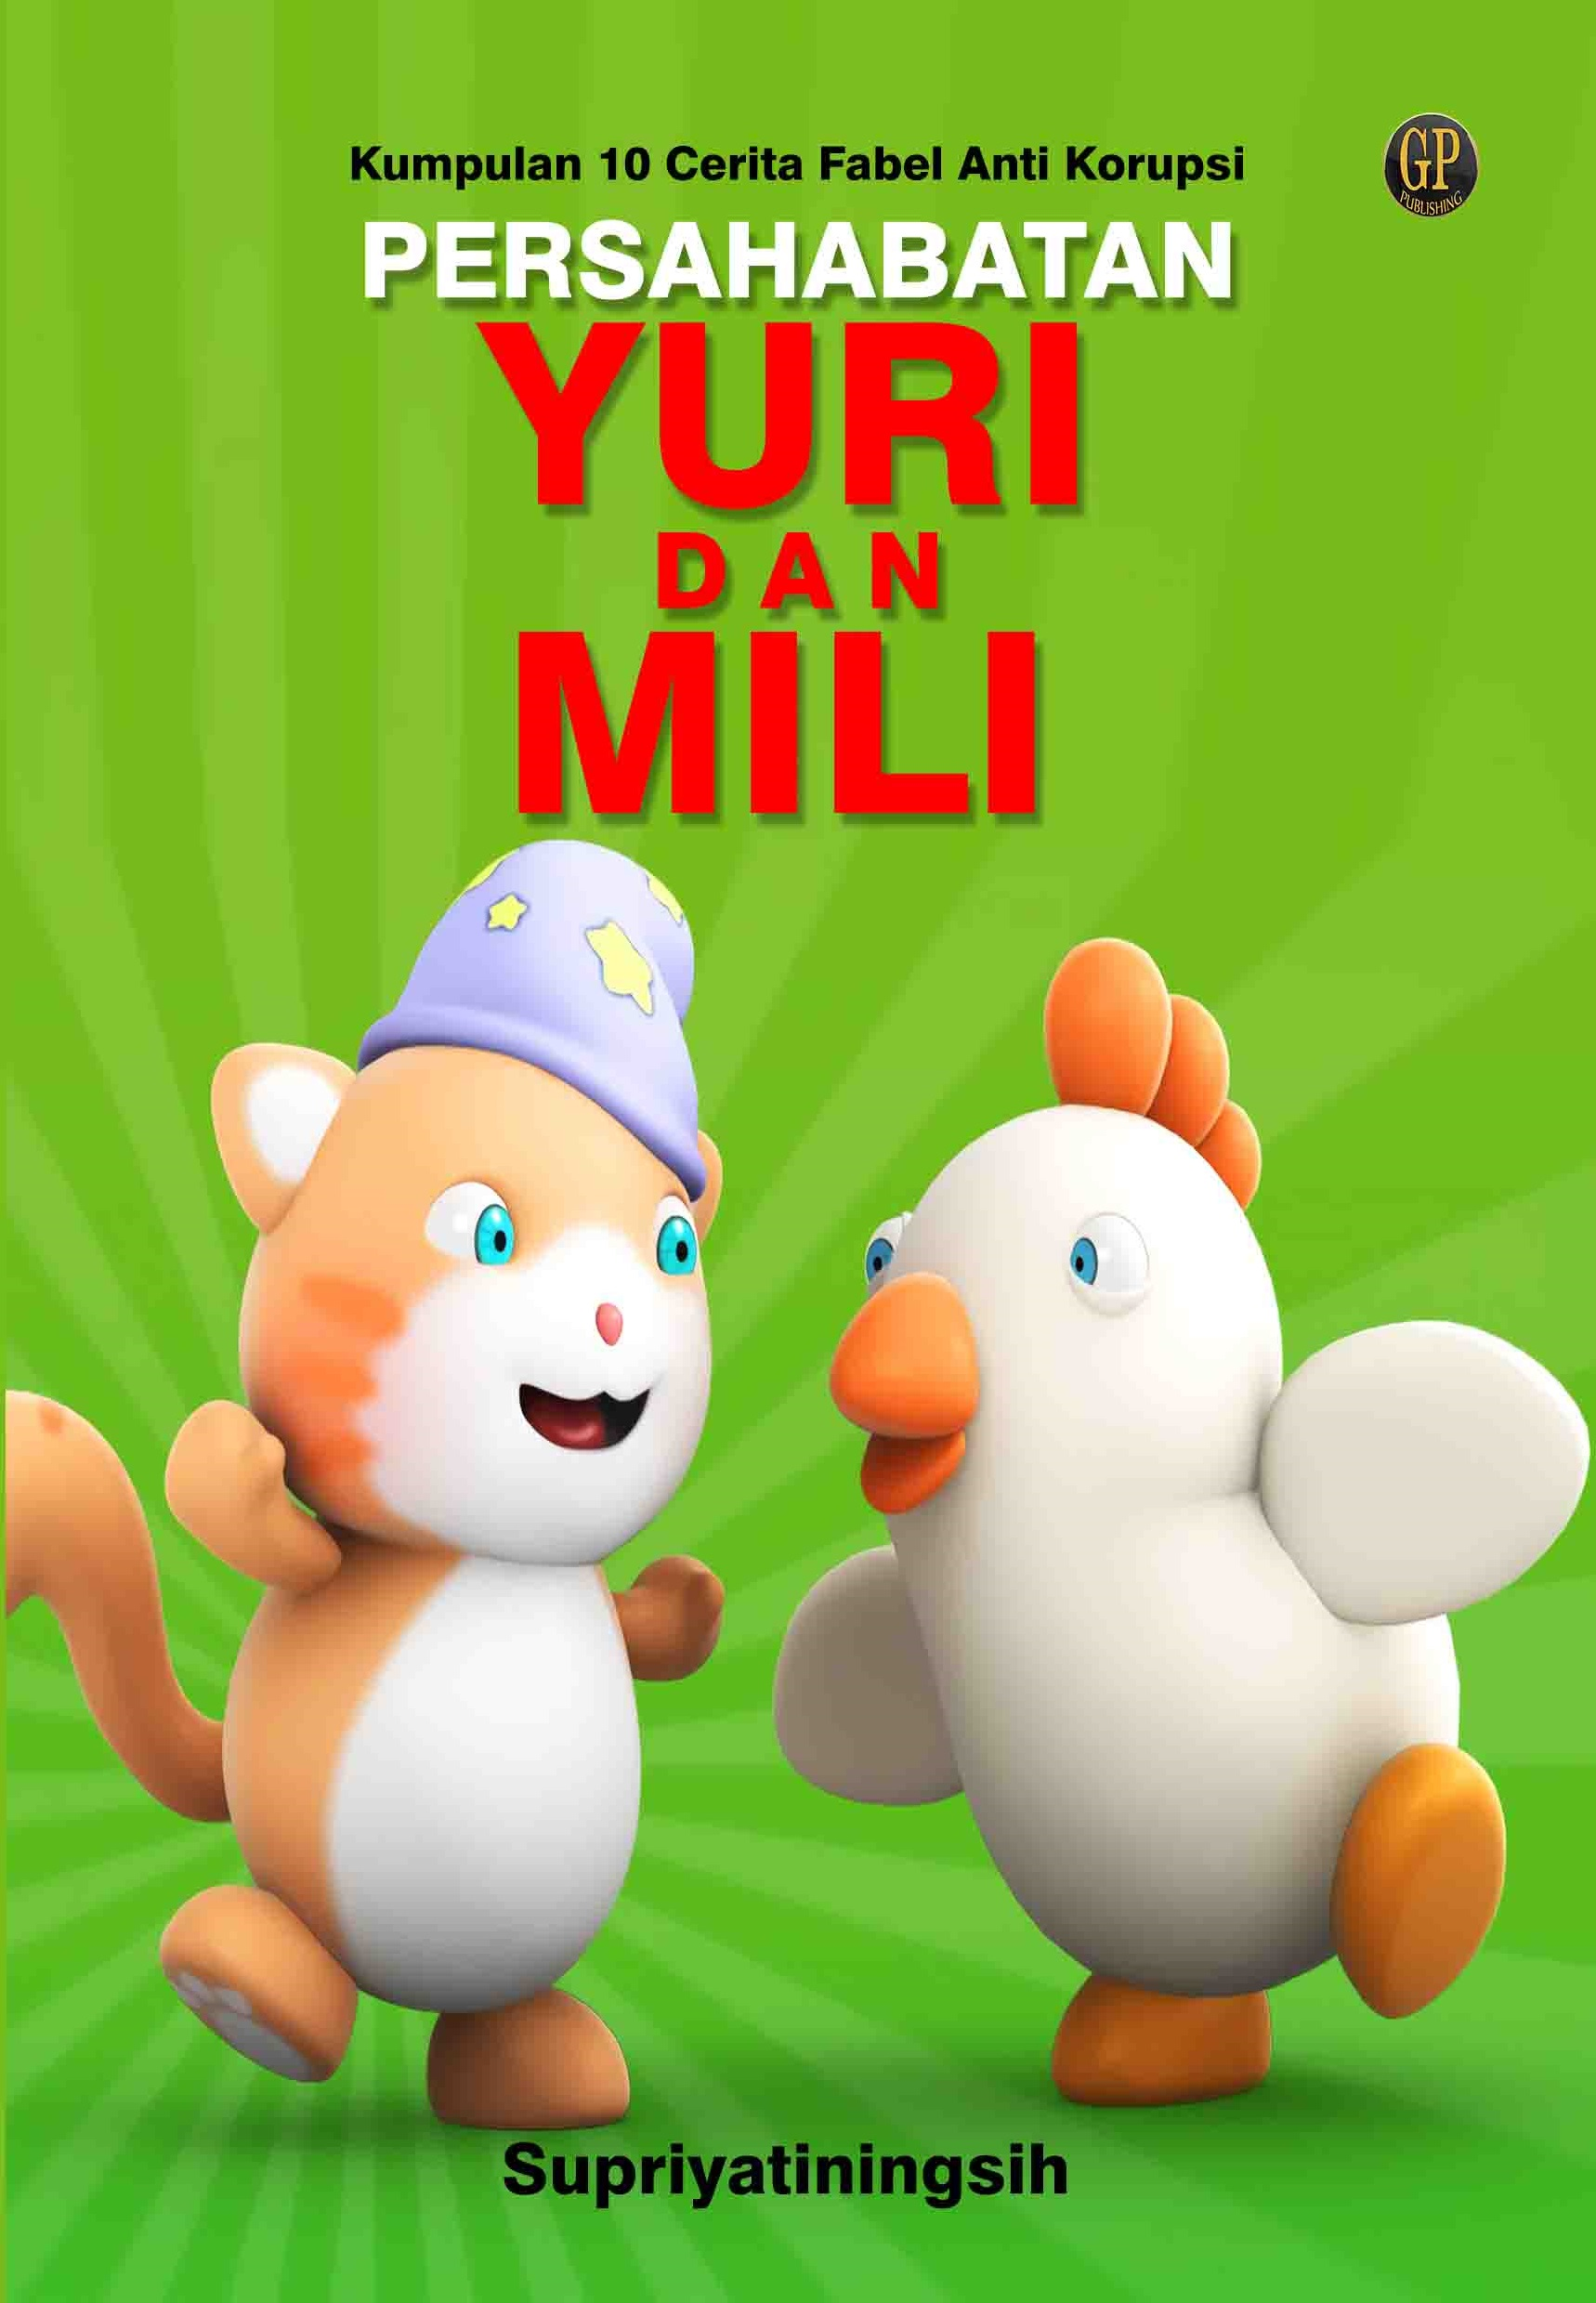 Persahabatan Yuri dan Mili [sumber elektronis] : kumpulan 10 cerita fabel anti korupsi